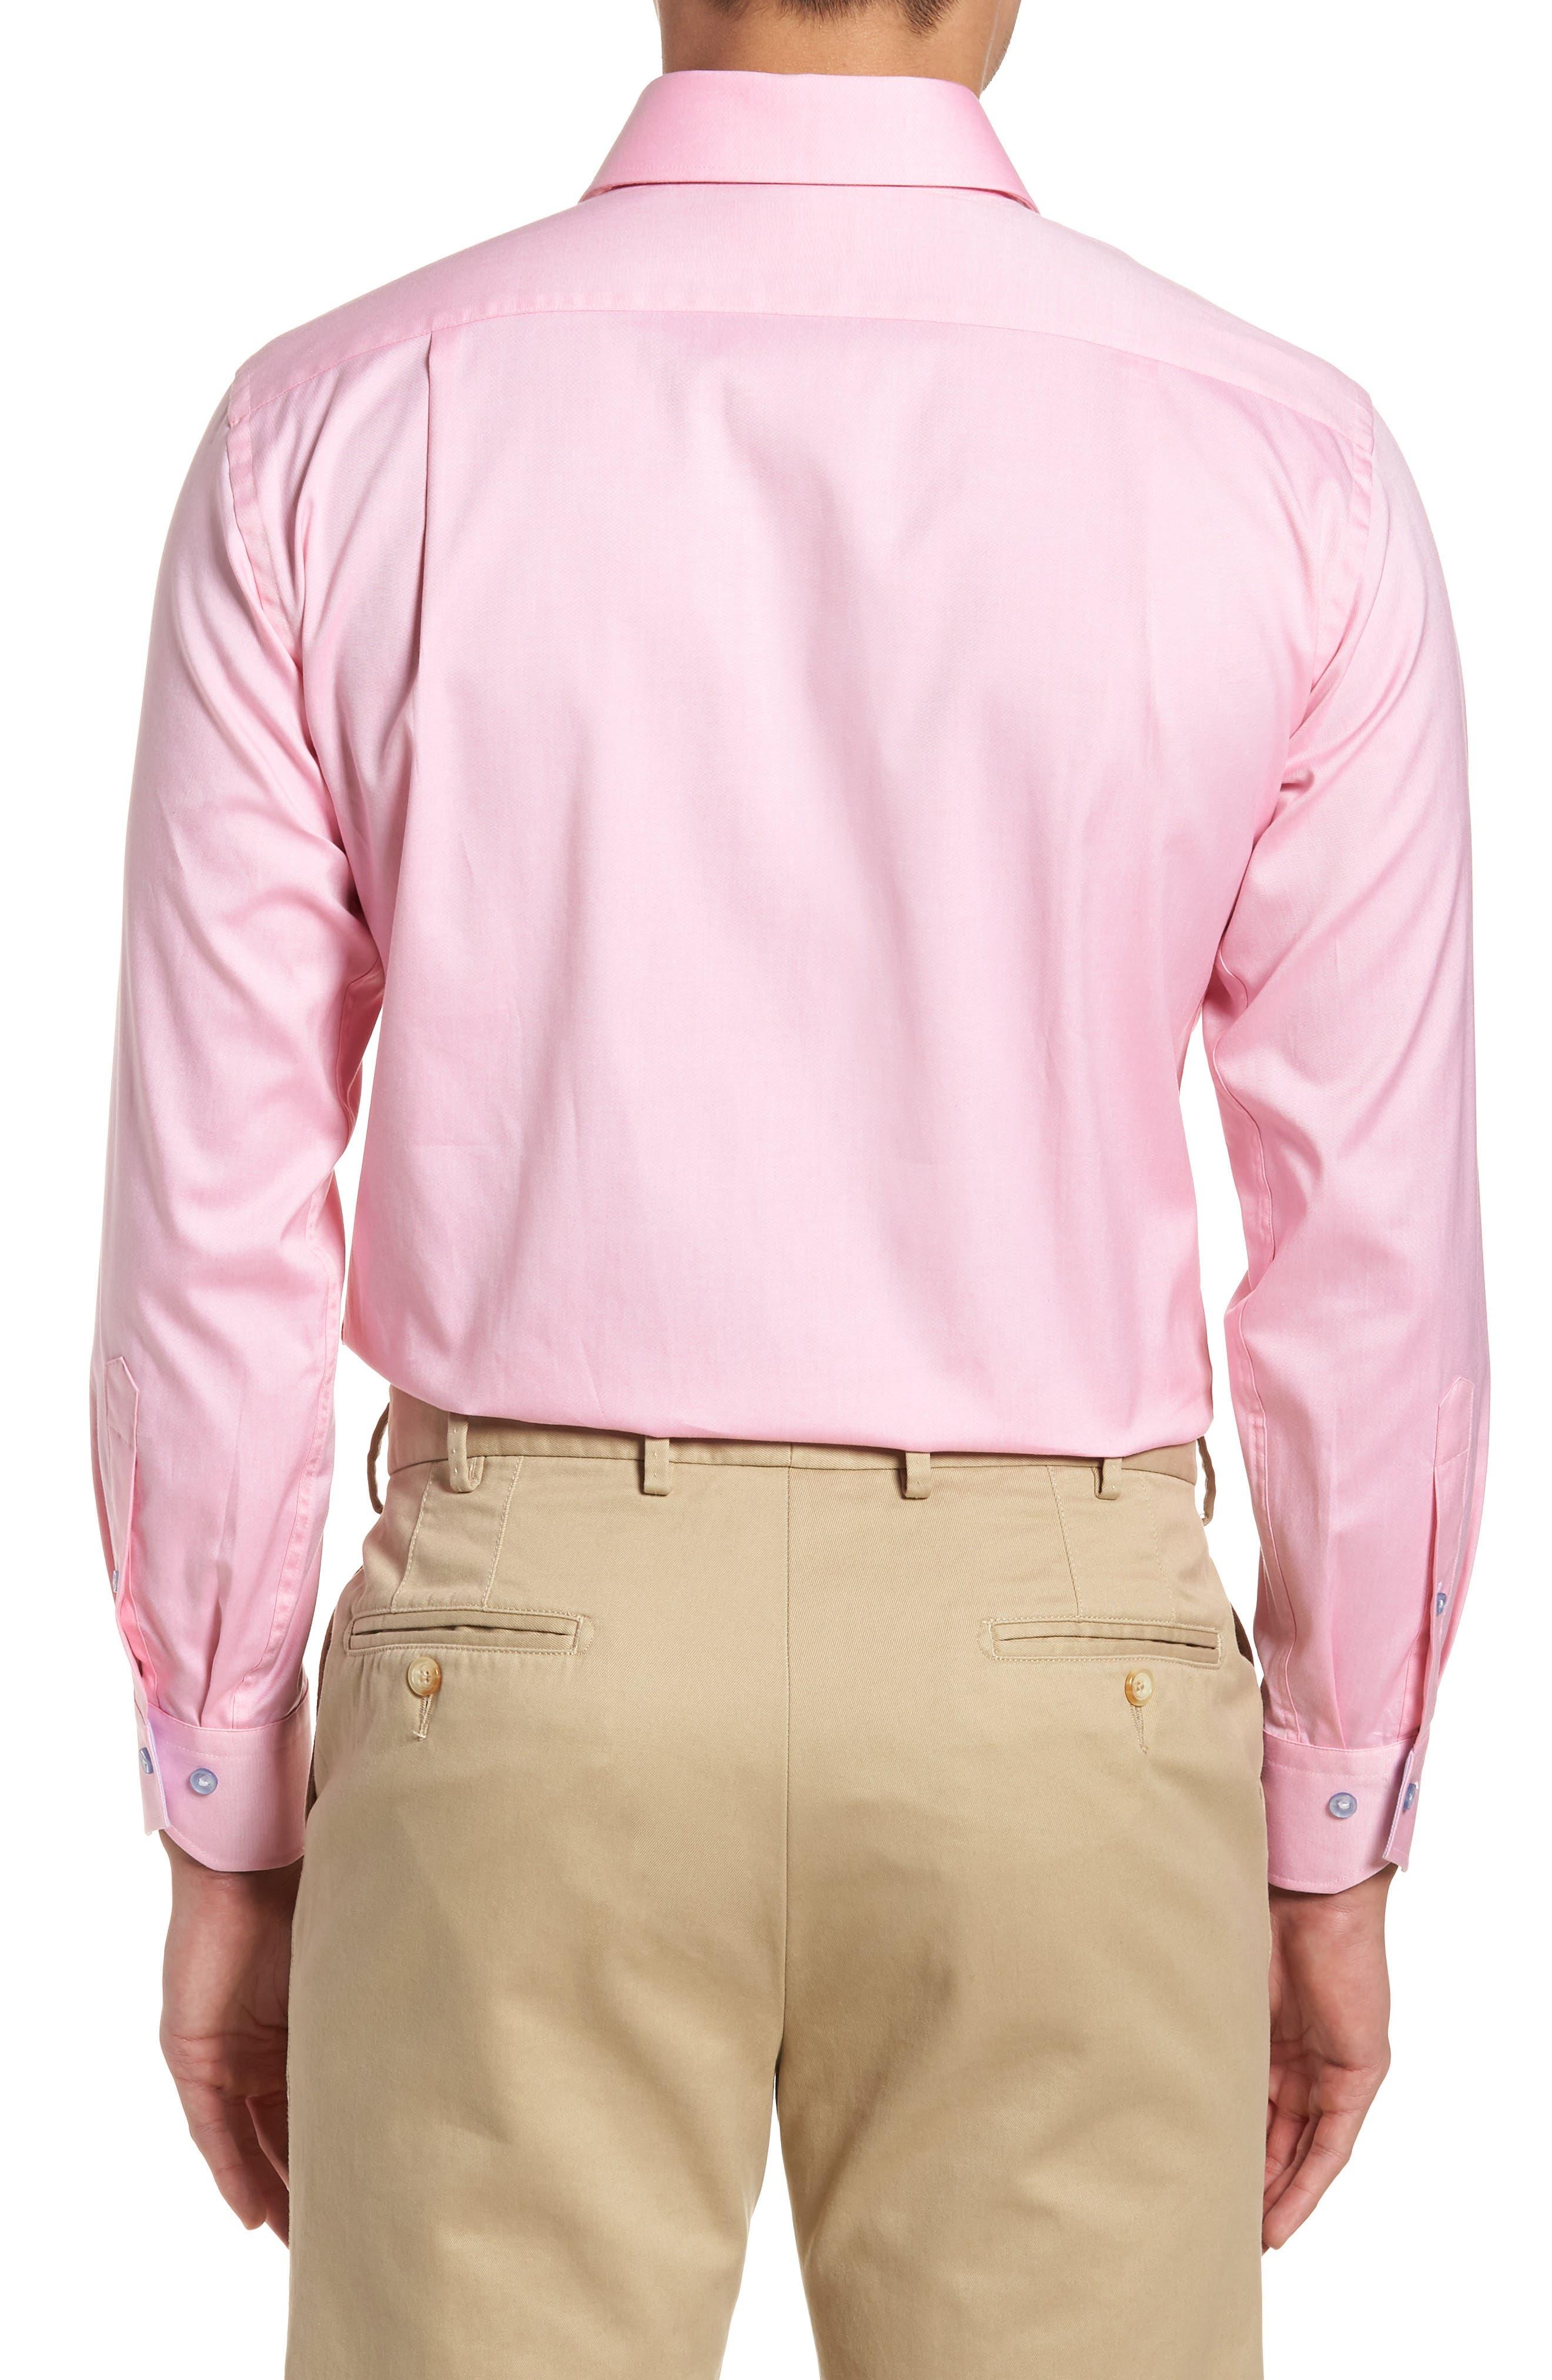 Trim Fit Oxford Dress Shirt,                             Alternate thumbnail 3, color,                             Pink